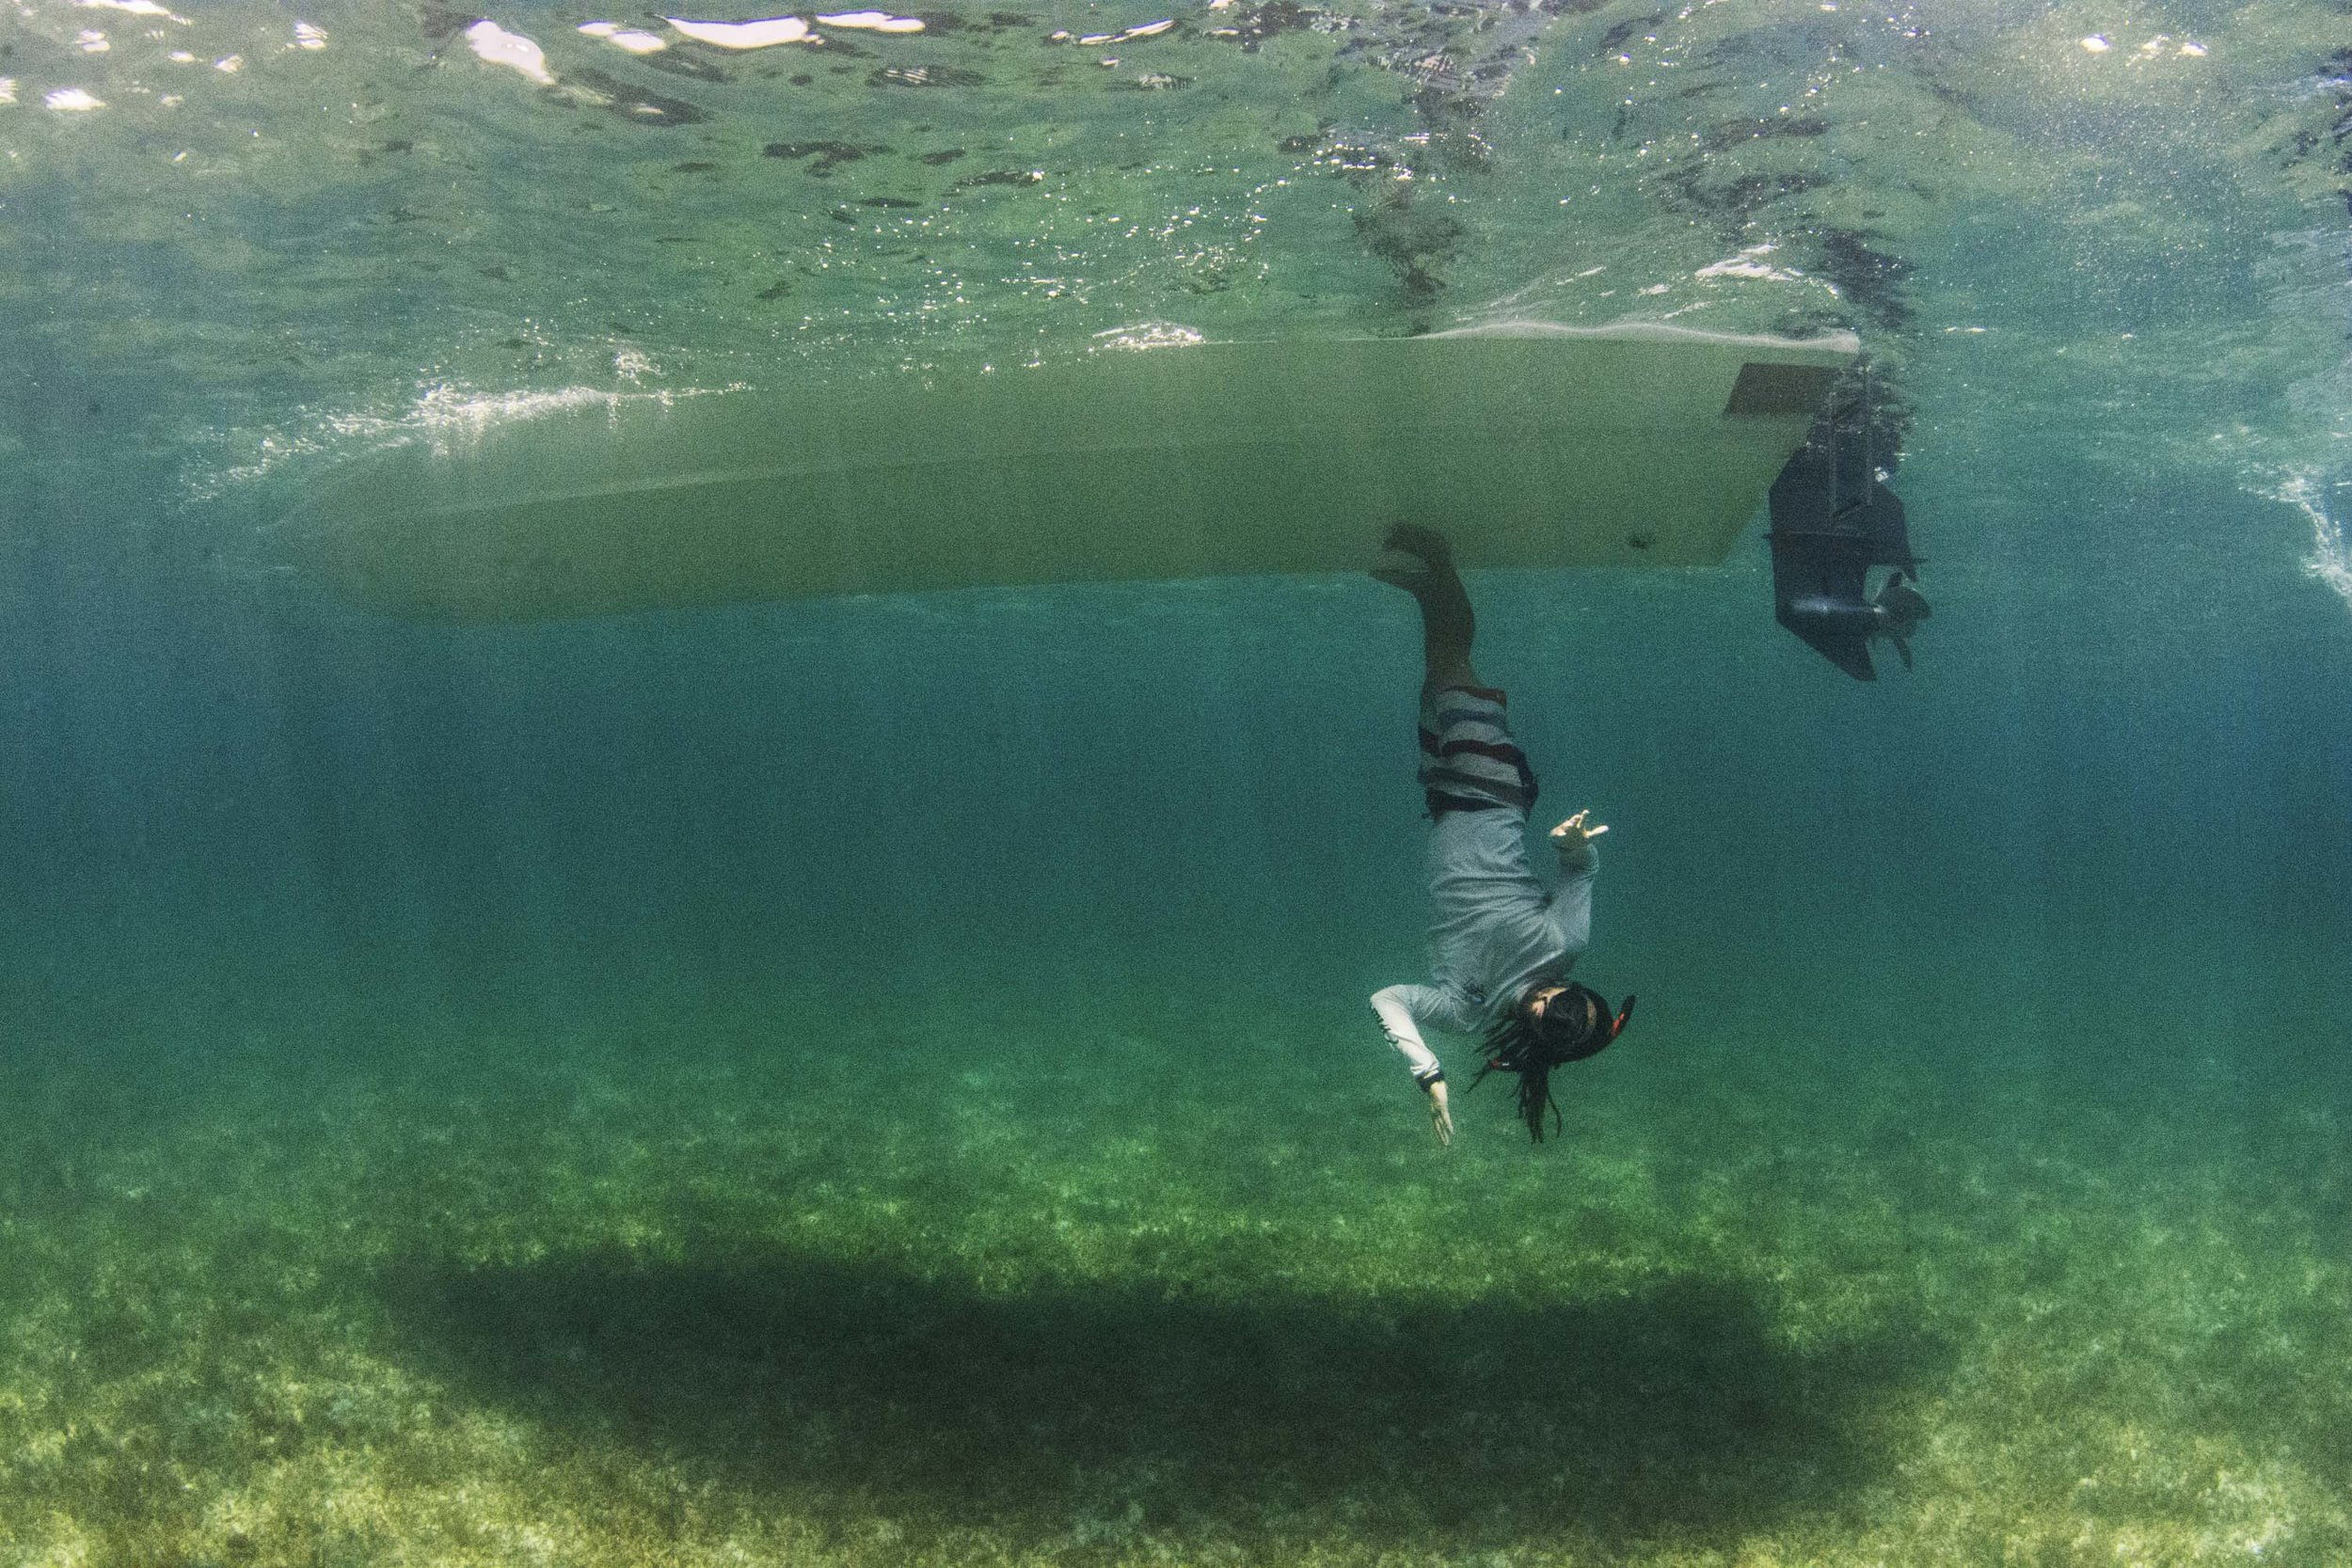 End of the dive snorkel antics!